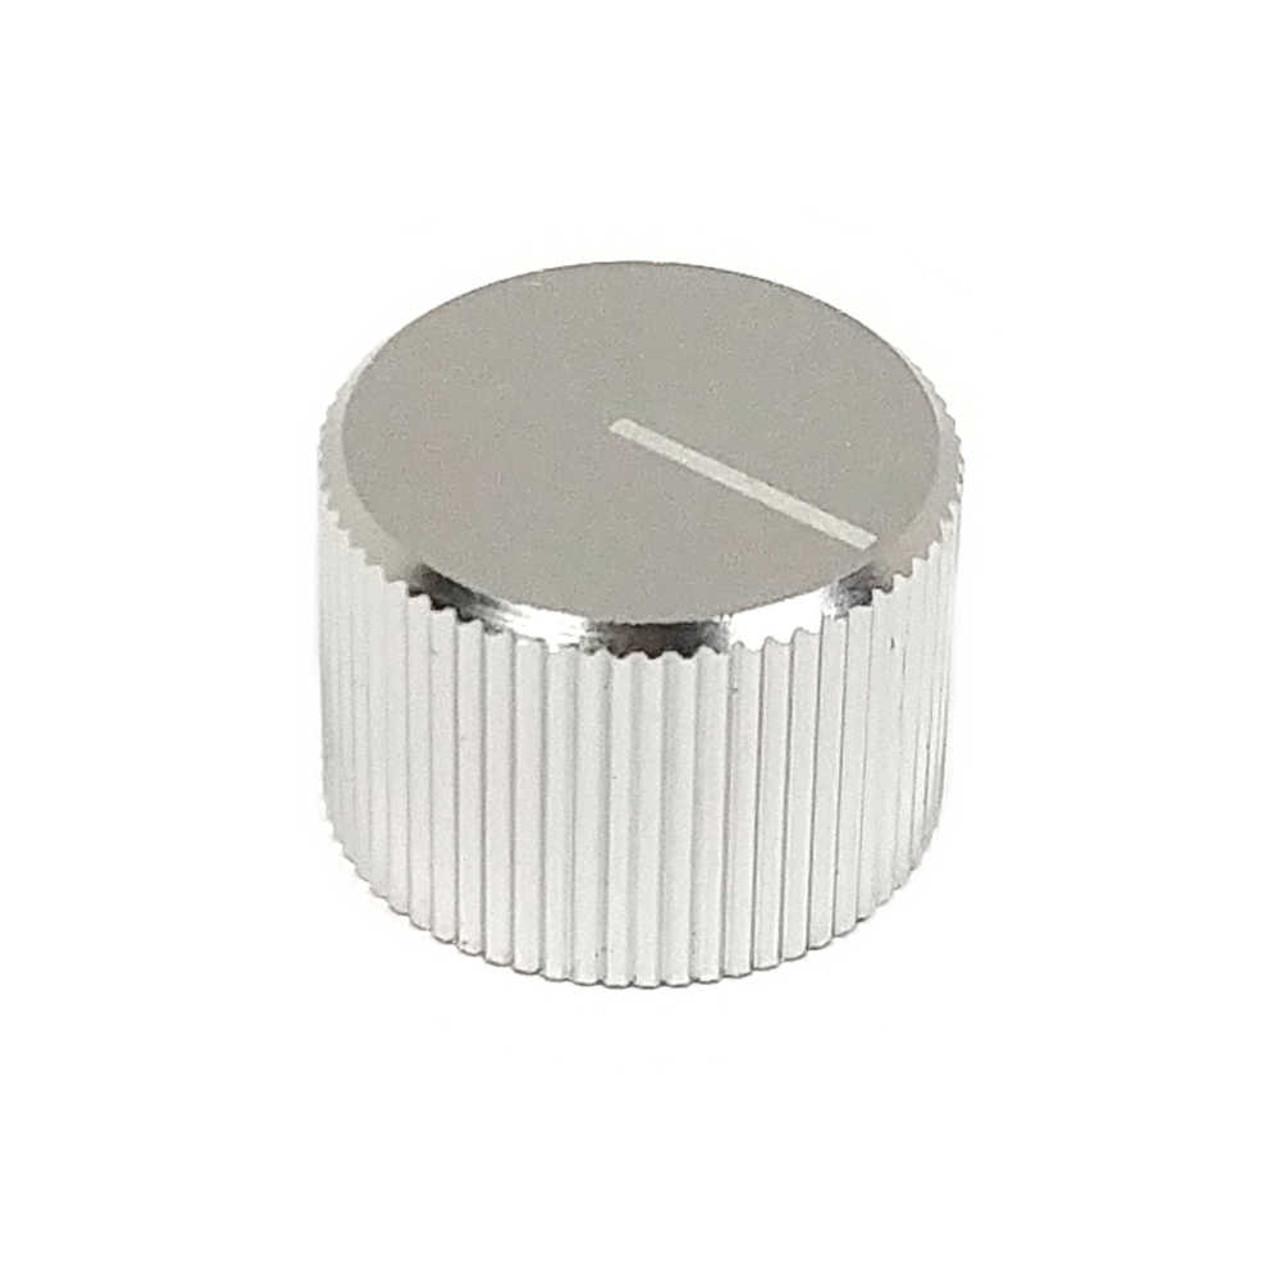 Anodized Aluminum Knob - Silver